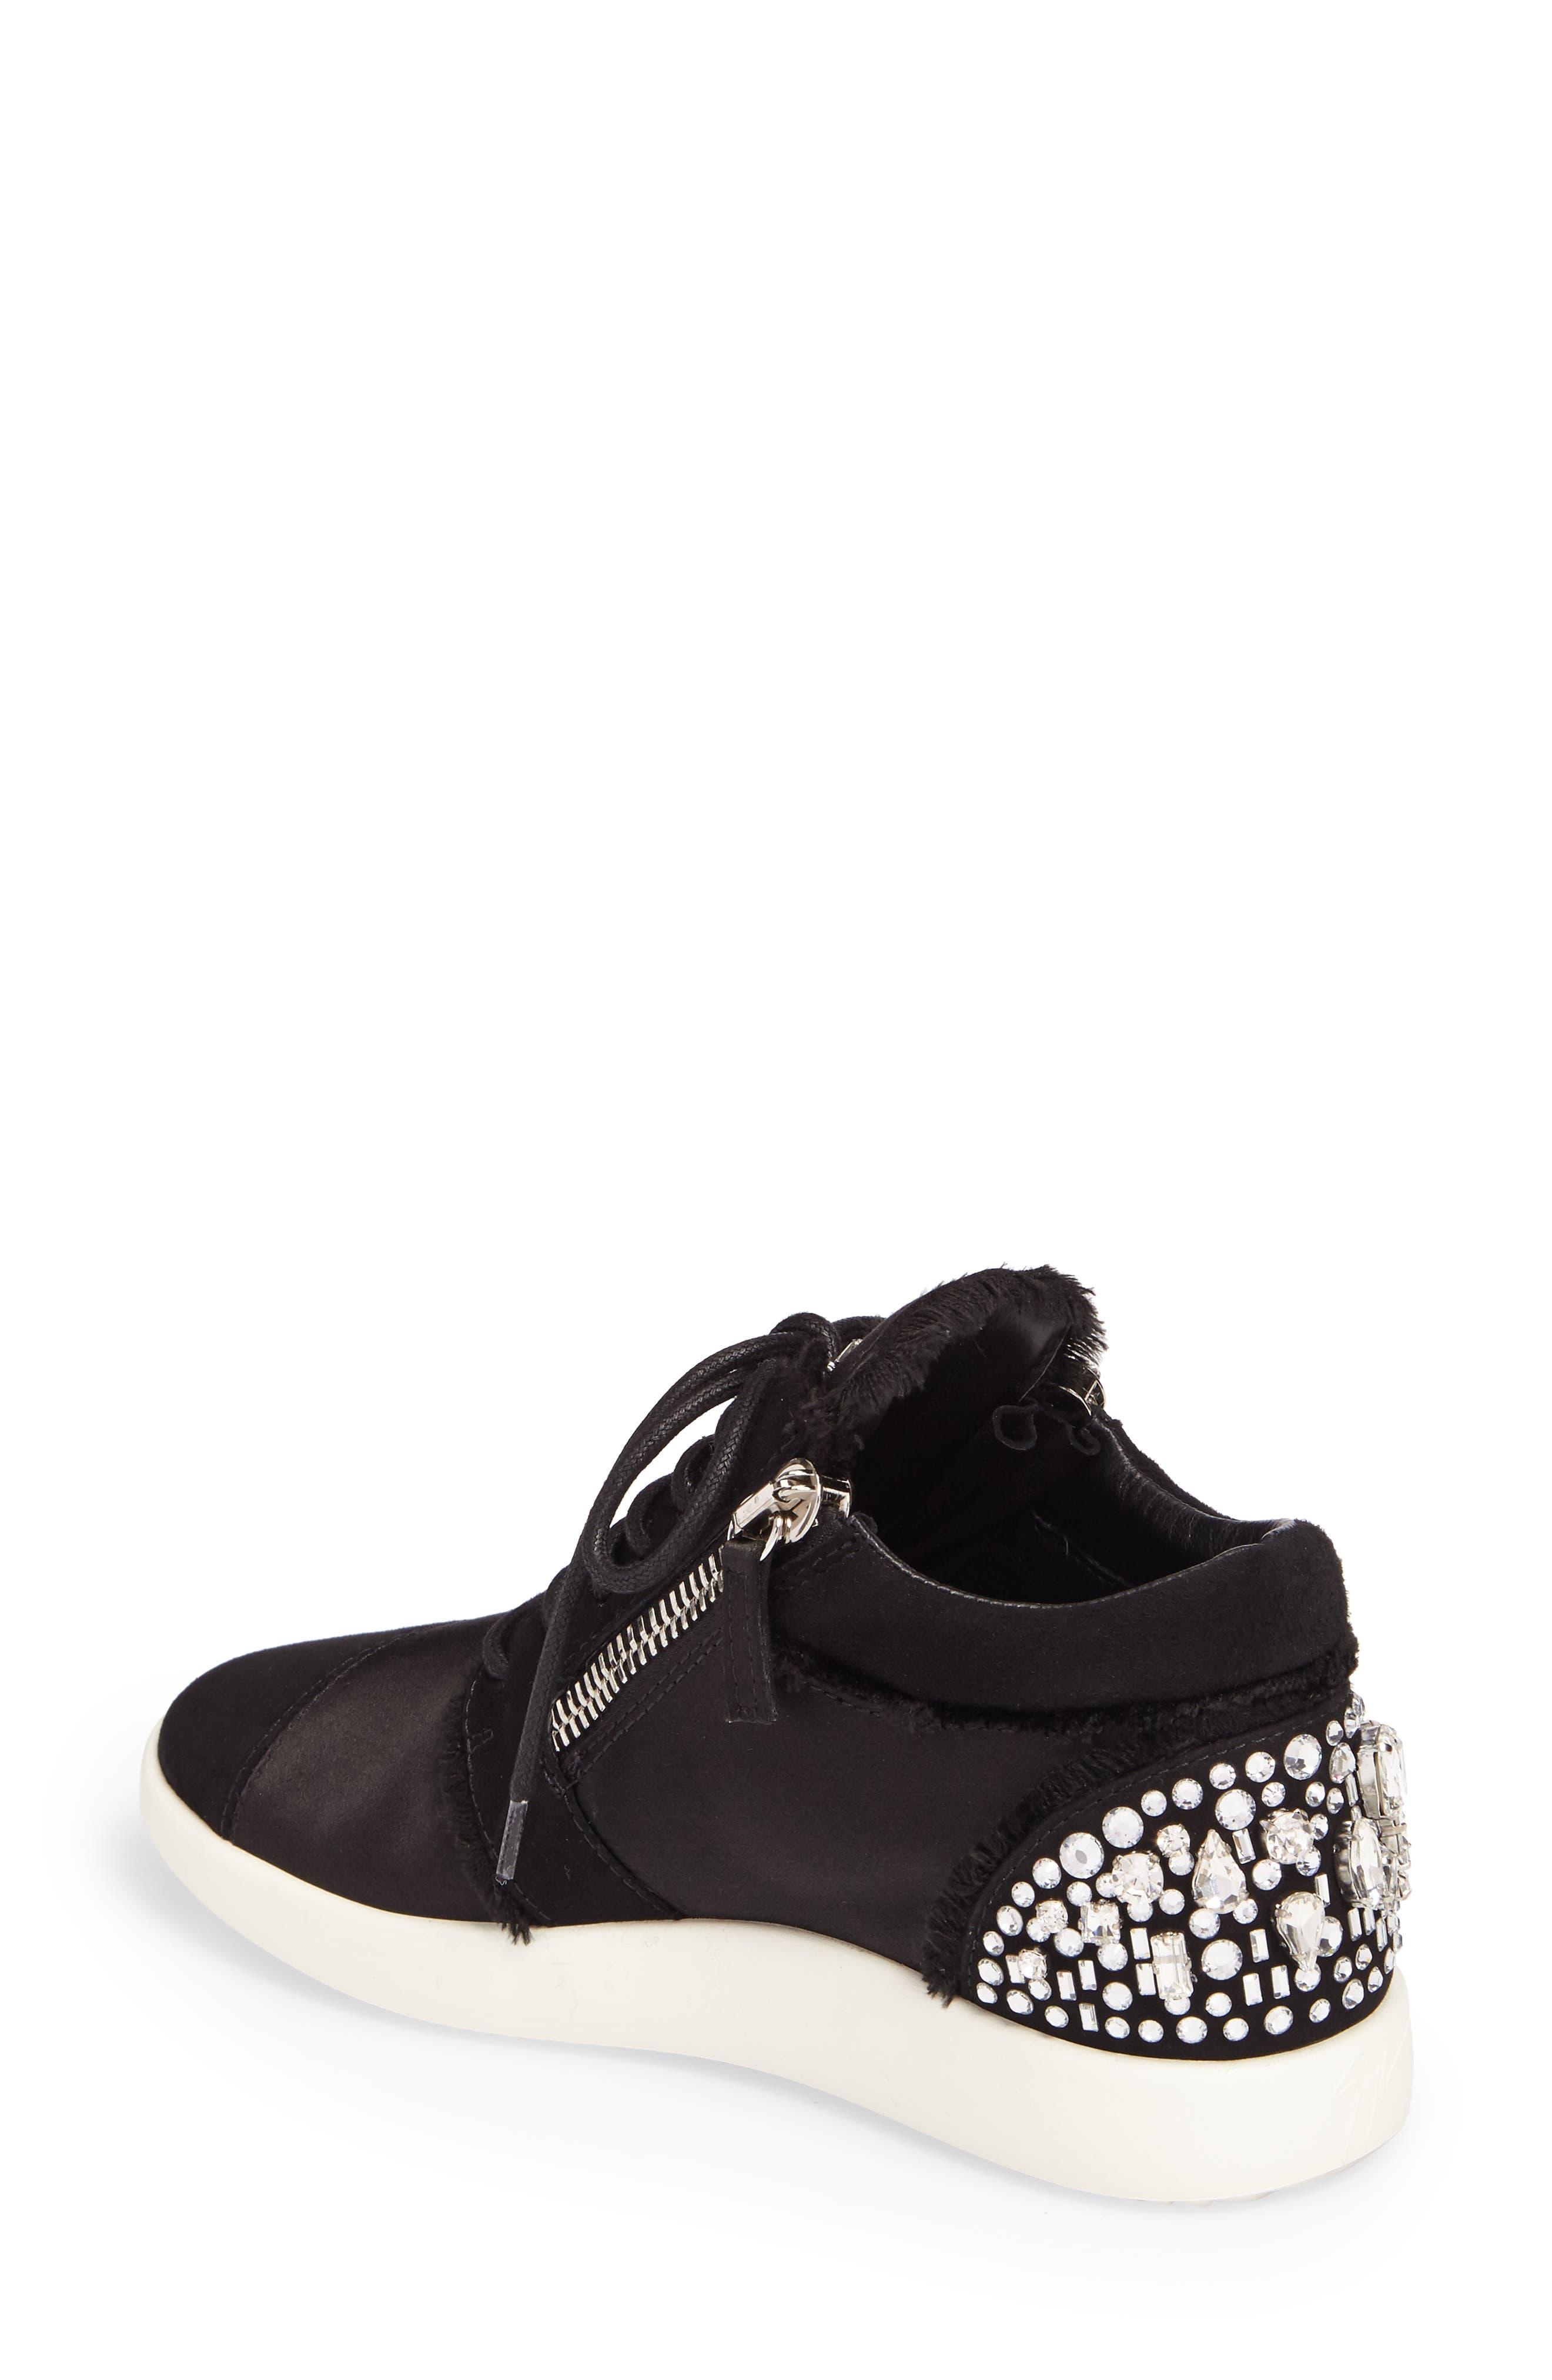 GIUSEPPE ZANOTTI,                             Swarovski Crystal Embellished Sneaker,                             Alternate thumbnail 2, color,                             001